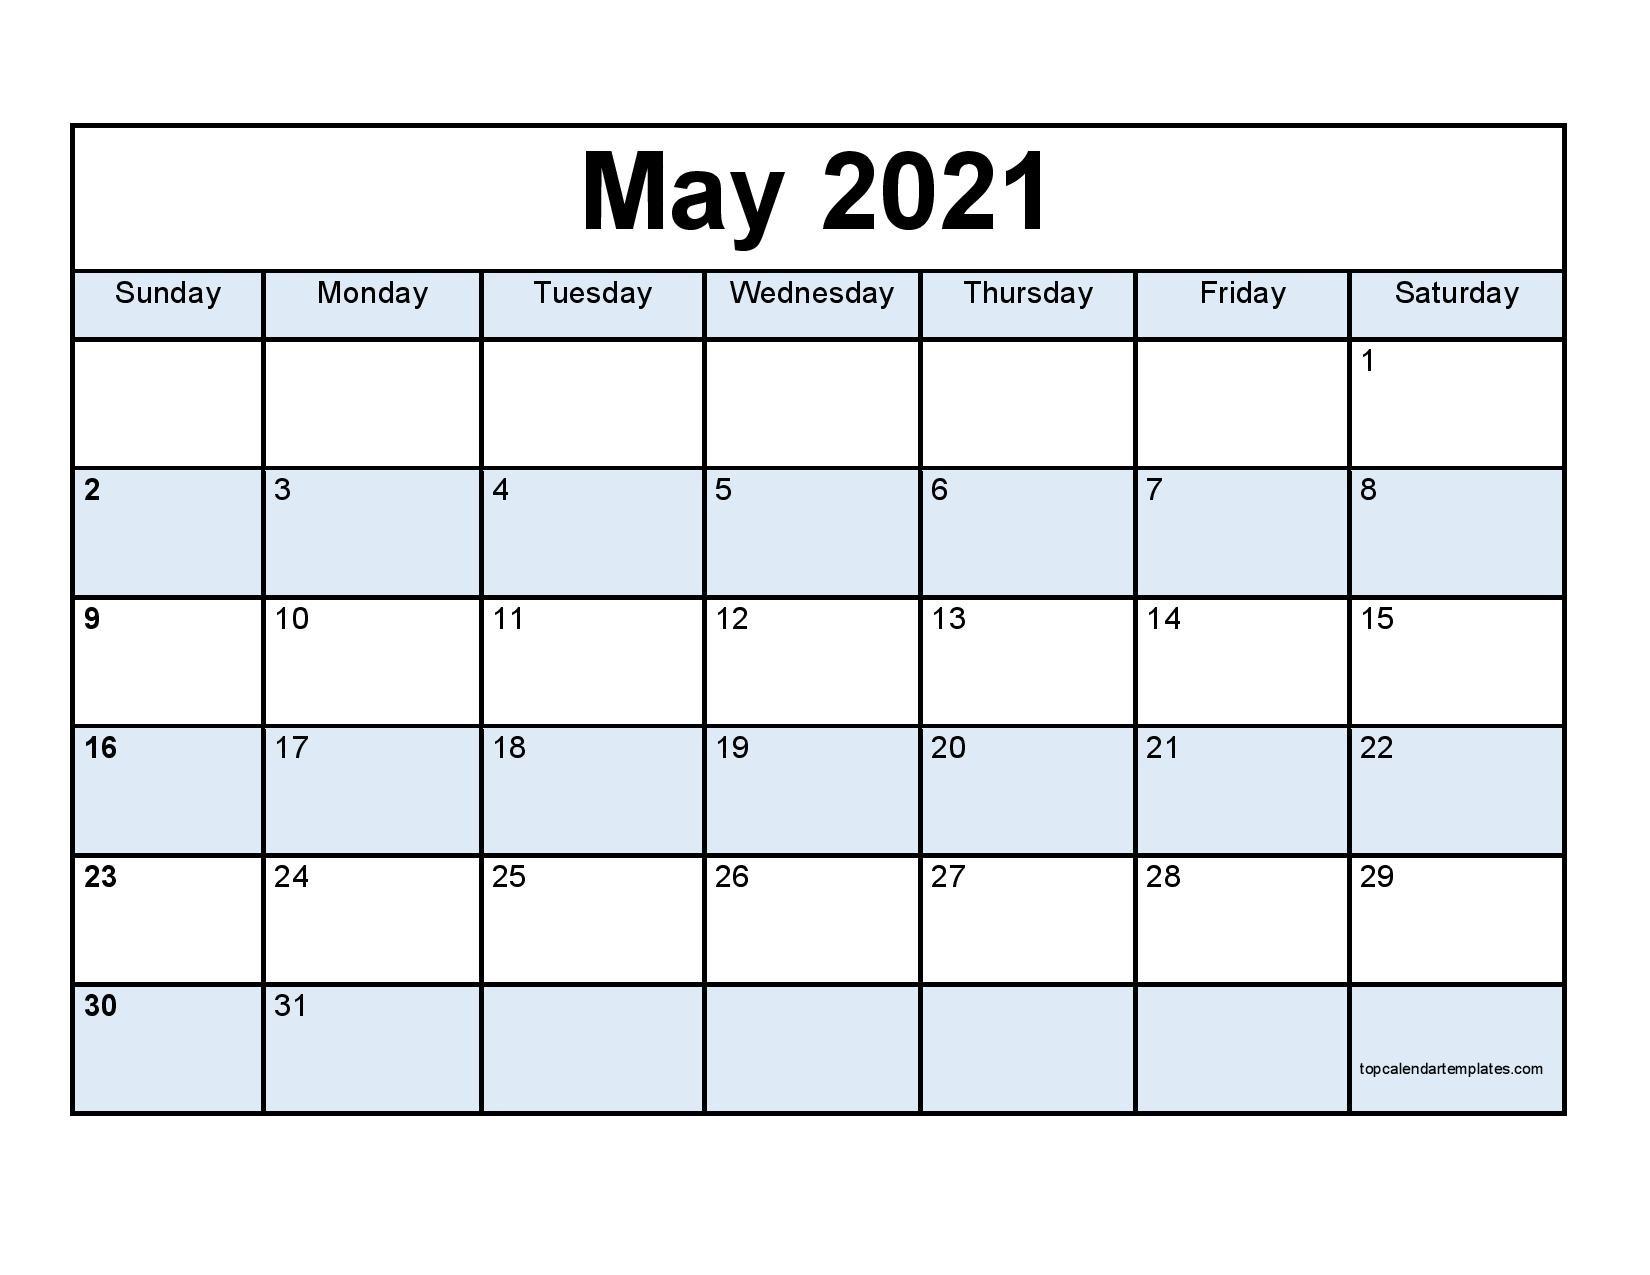 Free May 2021 Calendar Printable - Blank Templates  Free Blank Printable Monthly Calendar 2021